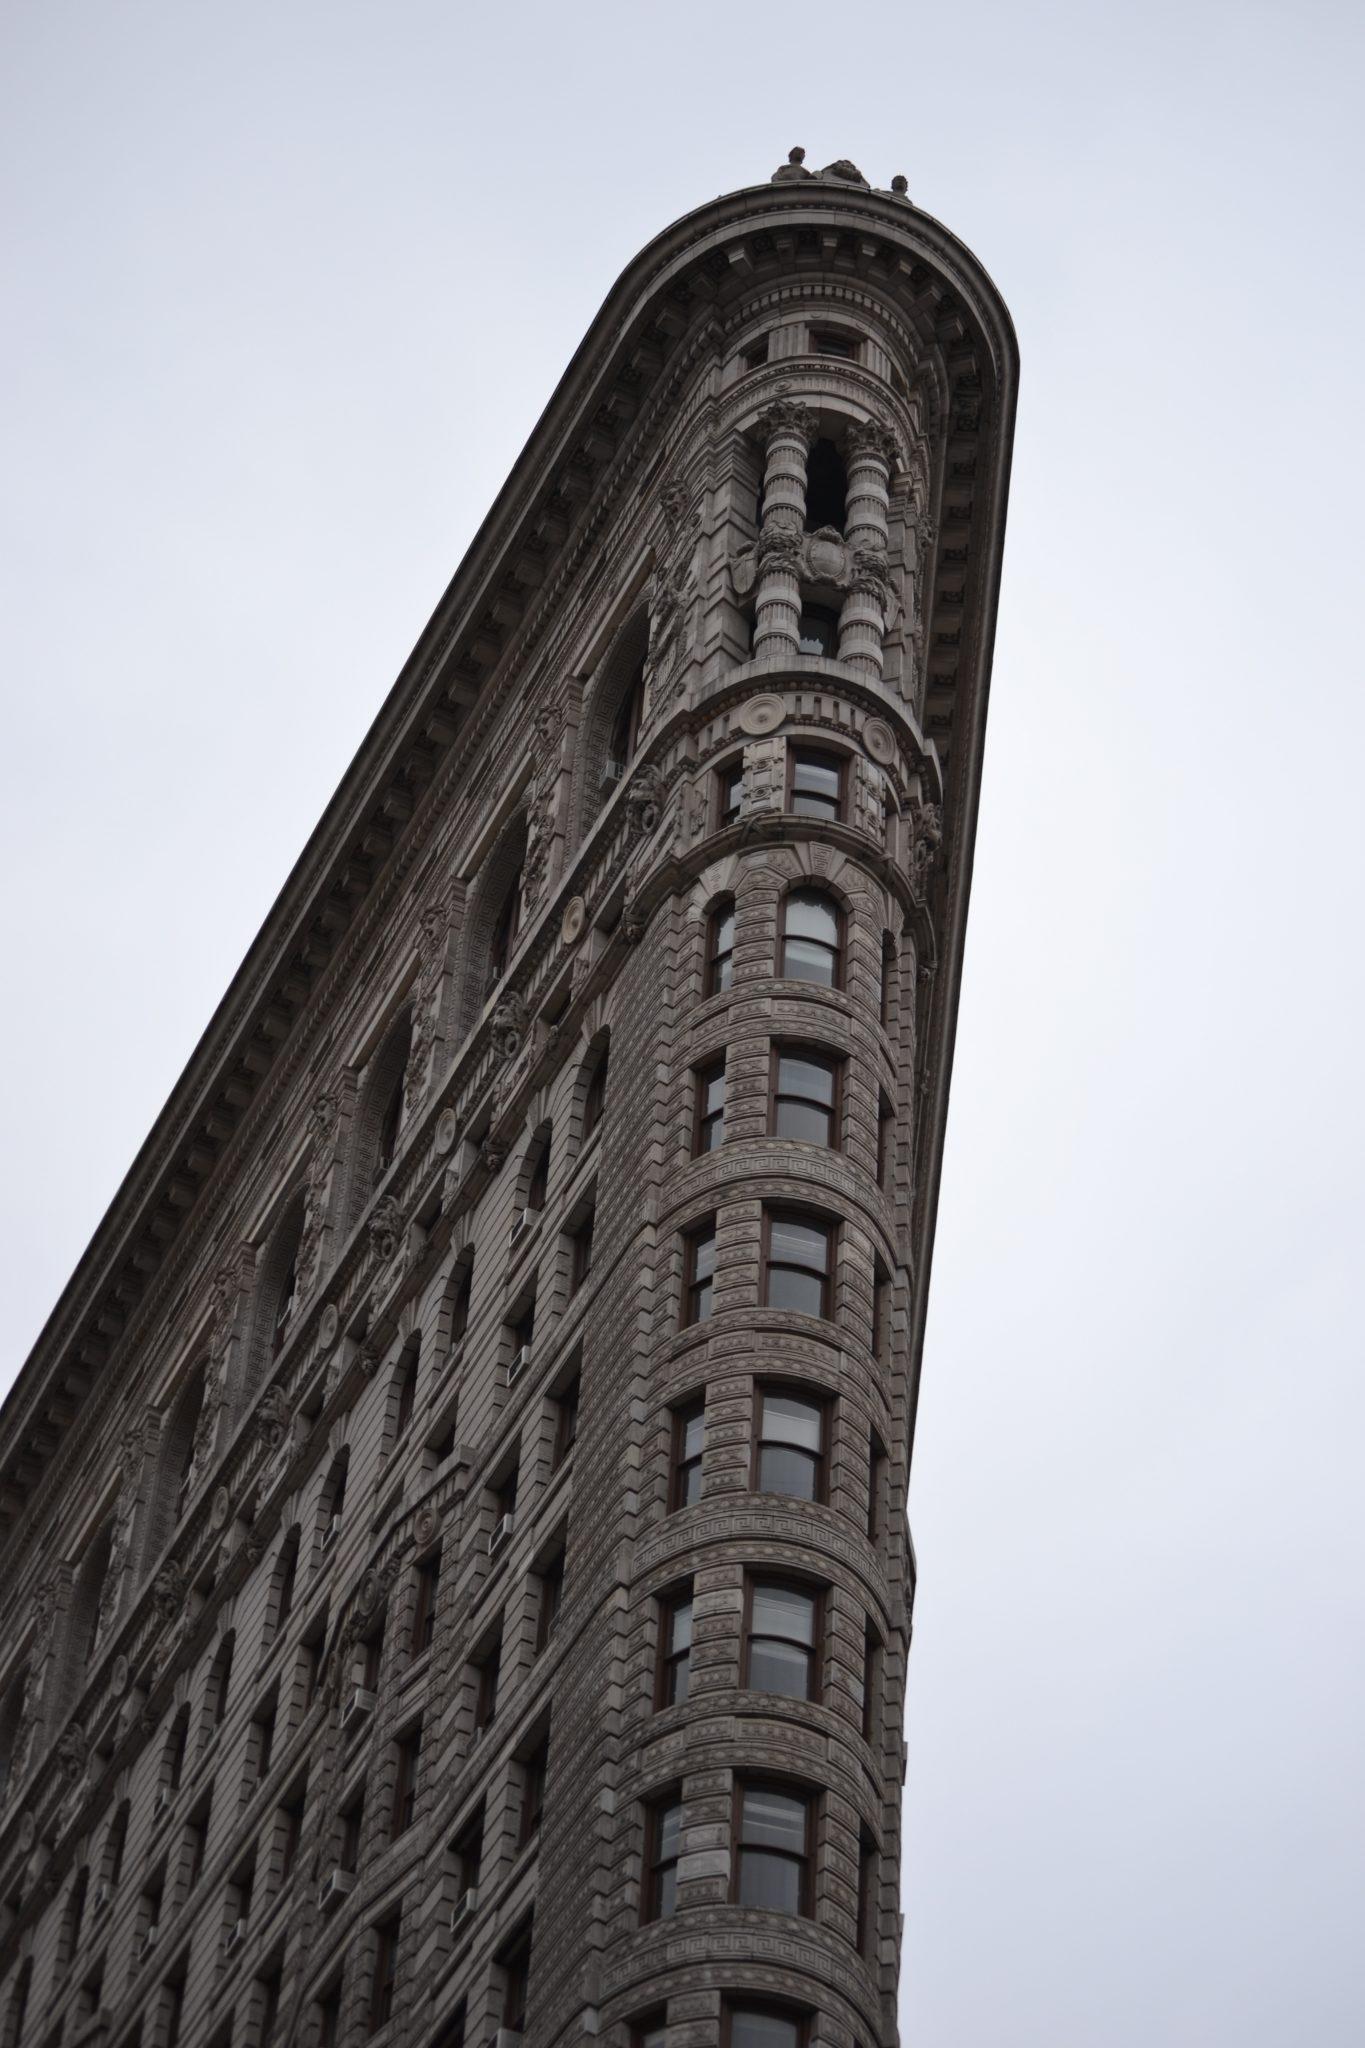 Eine Woche in New York: Washington Square Park & Madison Square Park - dsc 0364